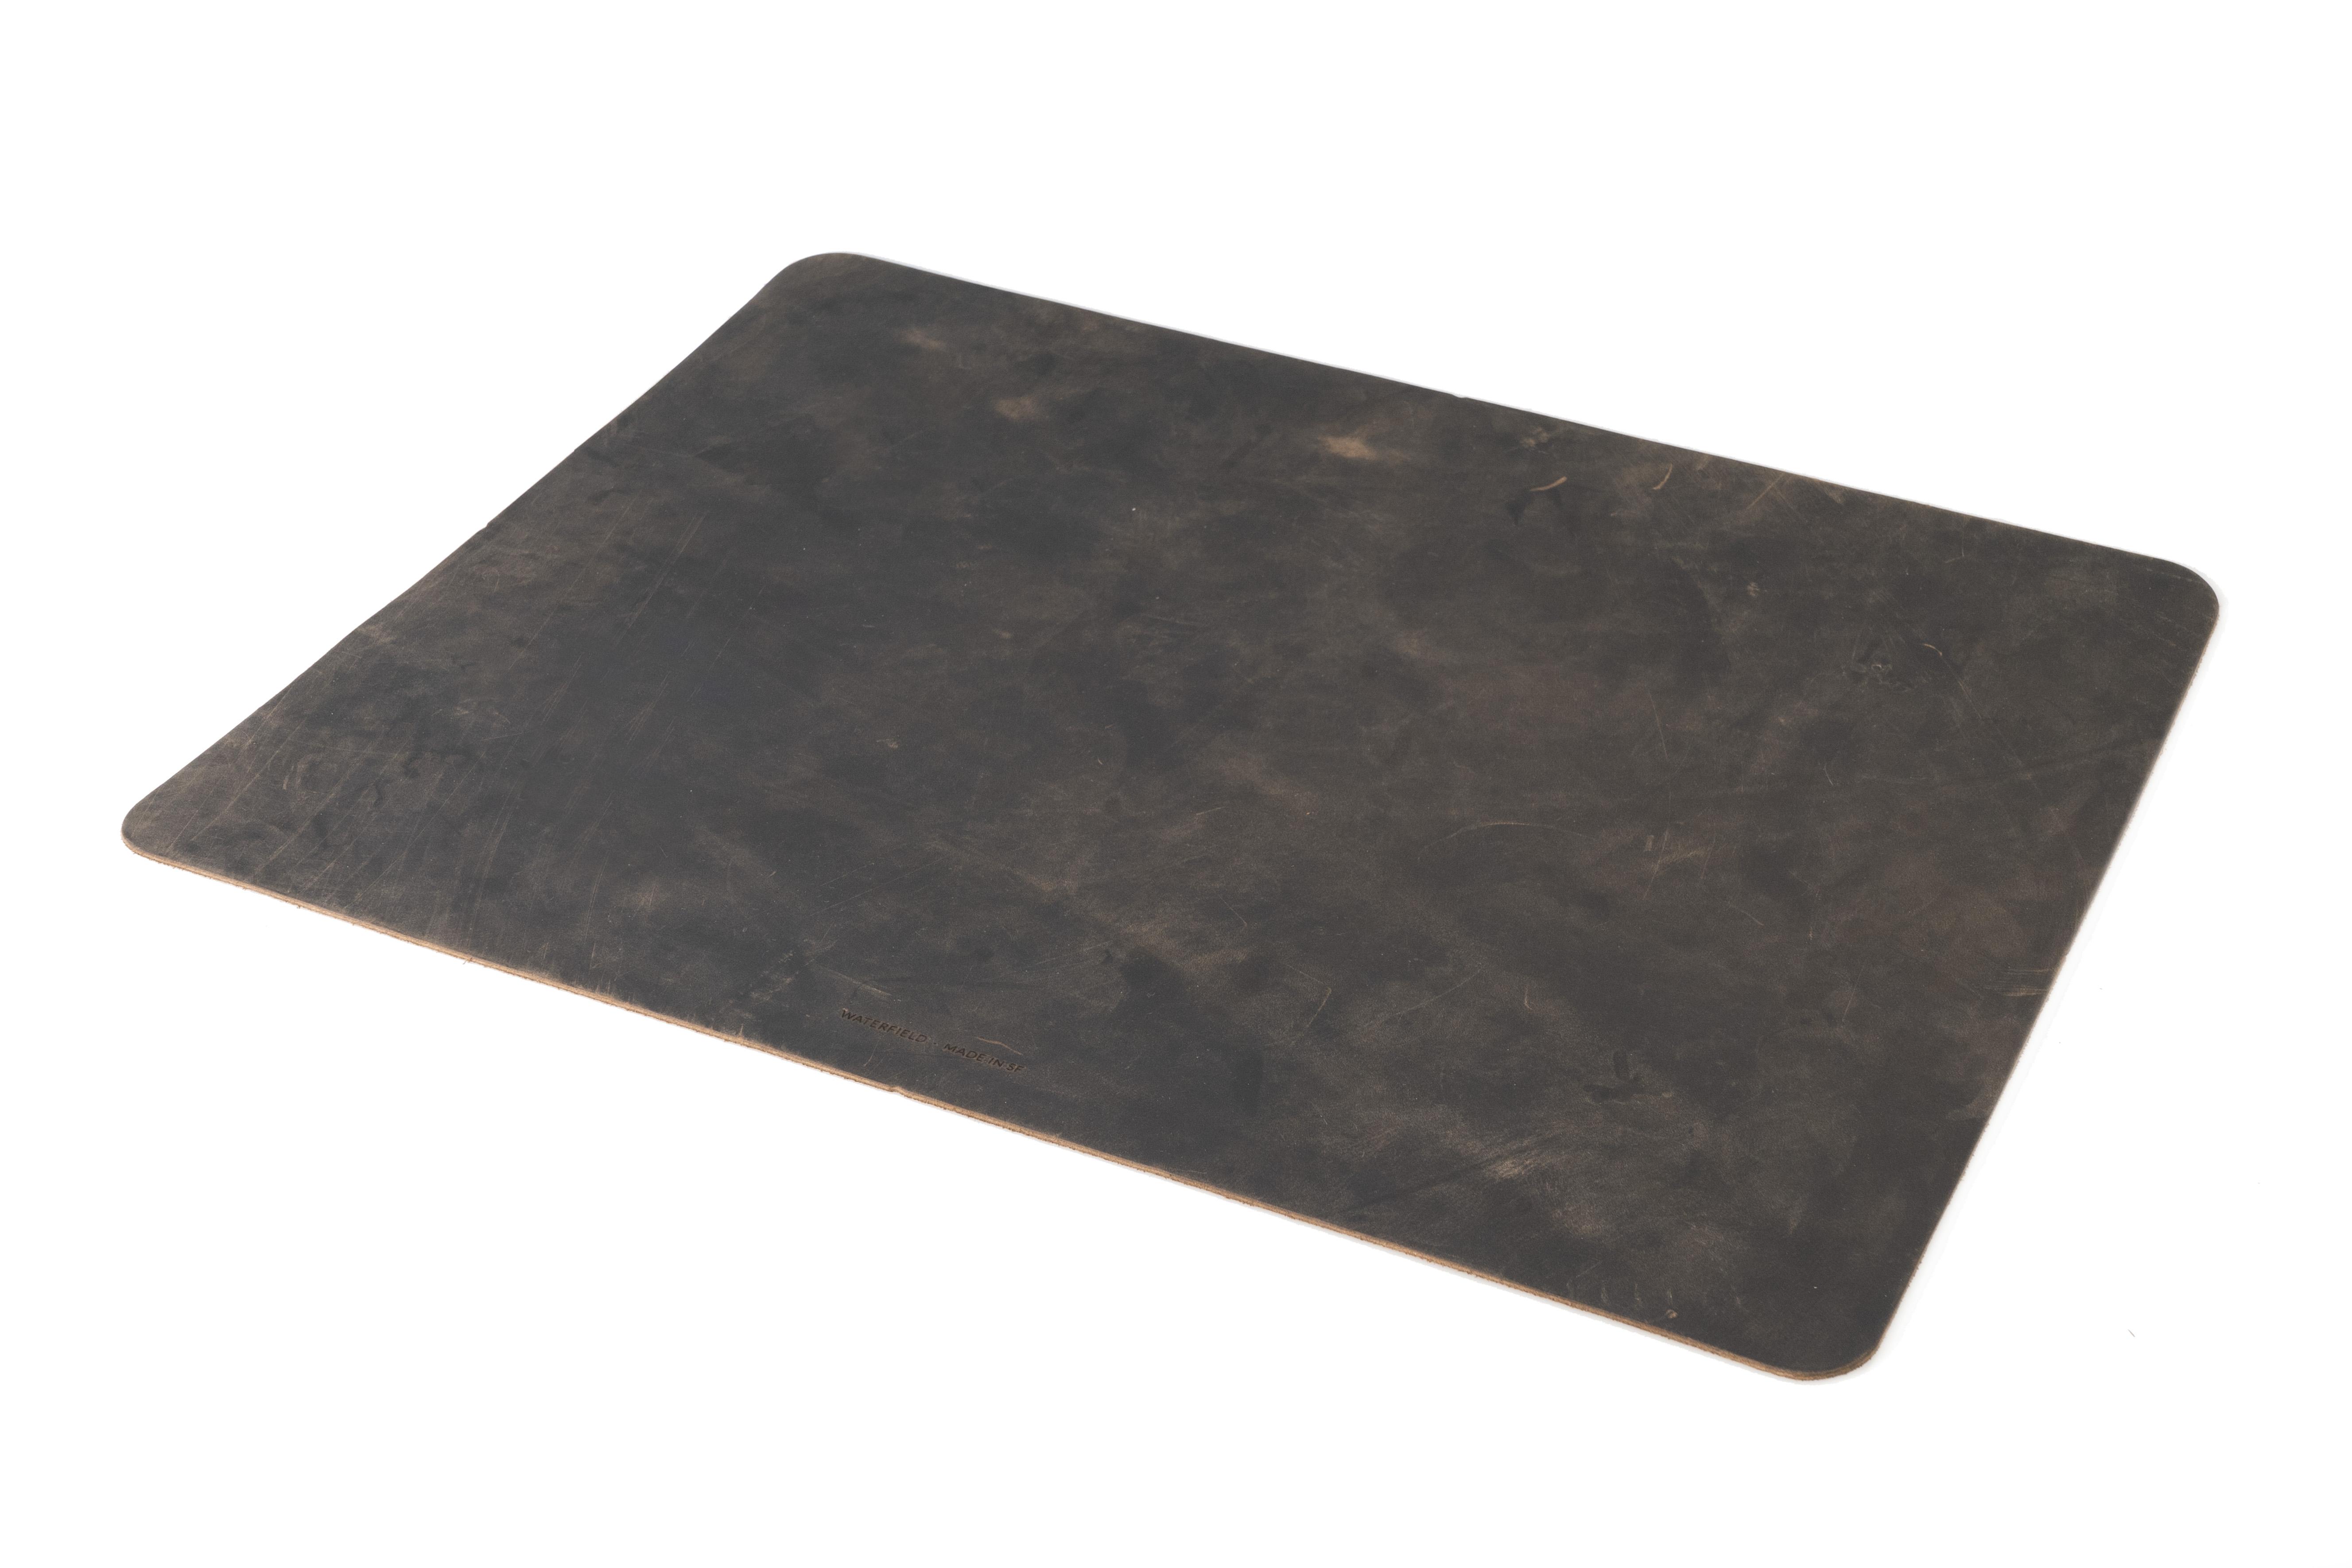 Waterfield Unveils Exquisite Leather Desk Accessories